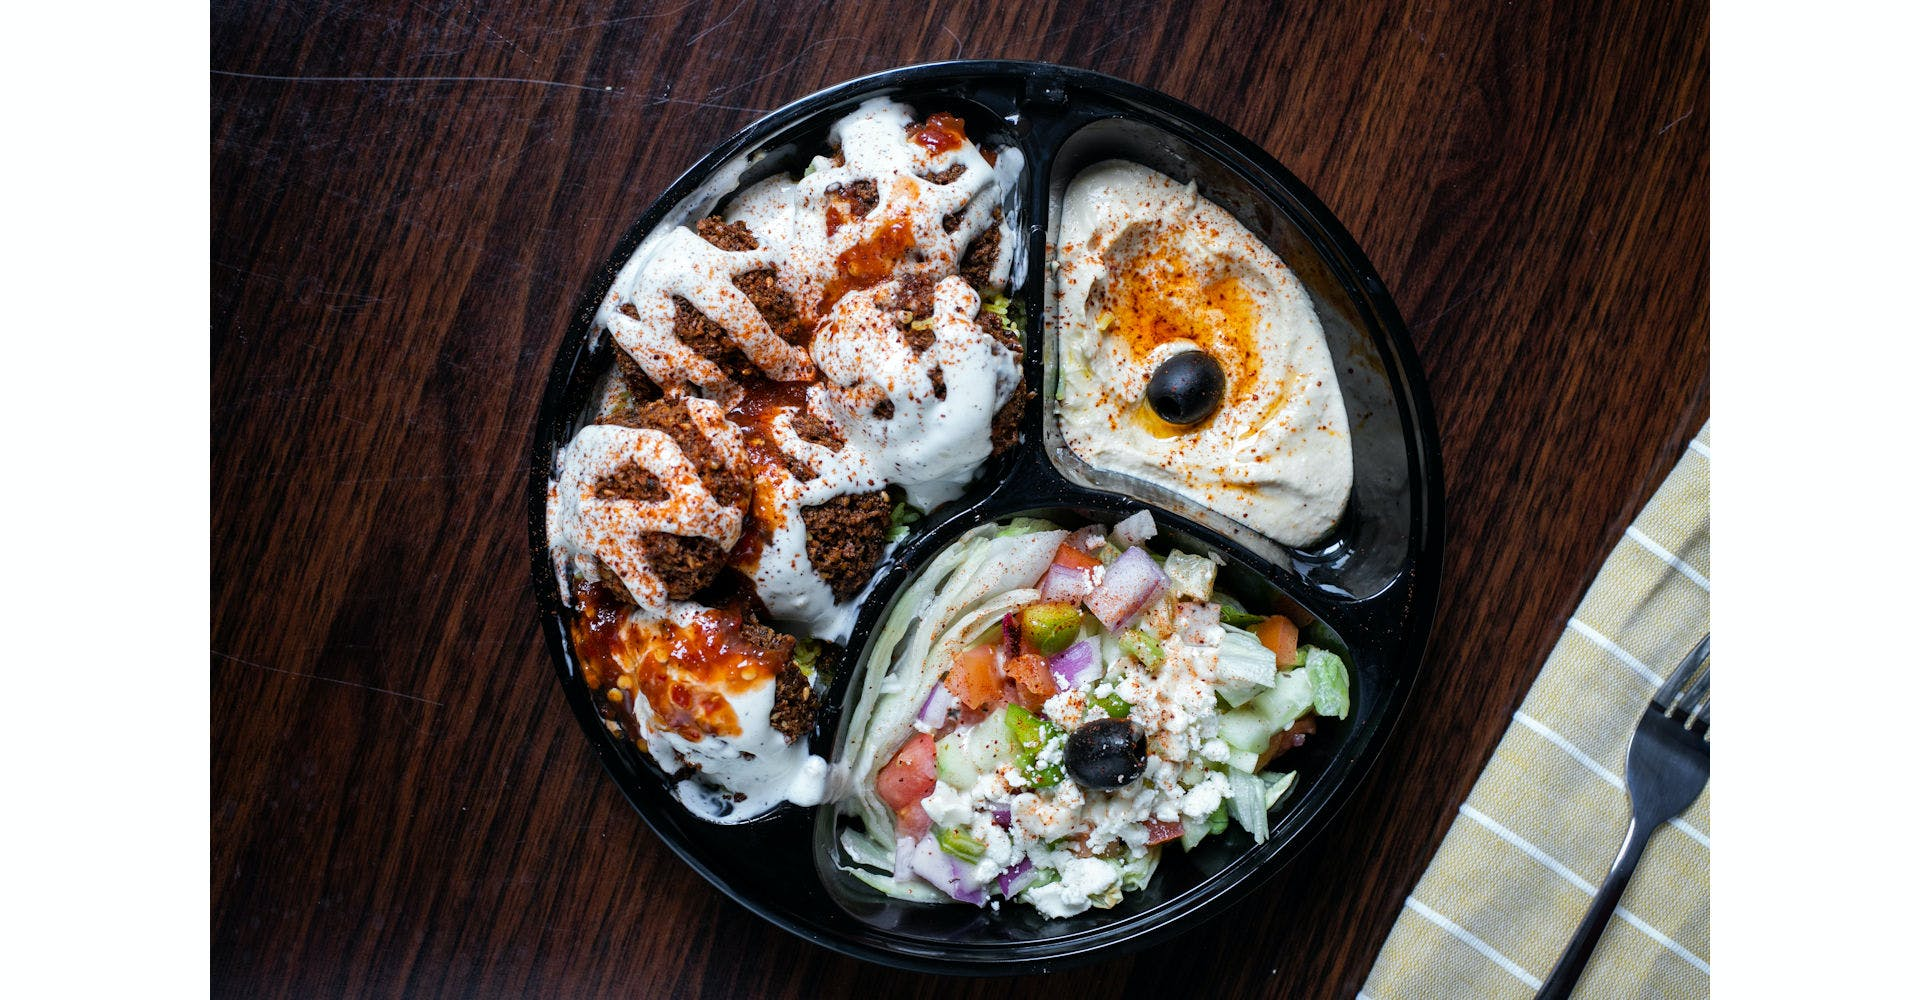 Falafel Plate from Austin's Habibi in Austin, TX